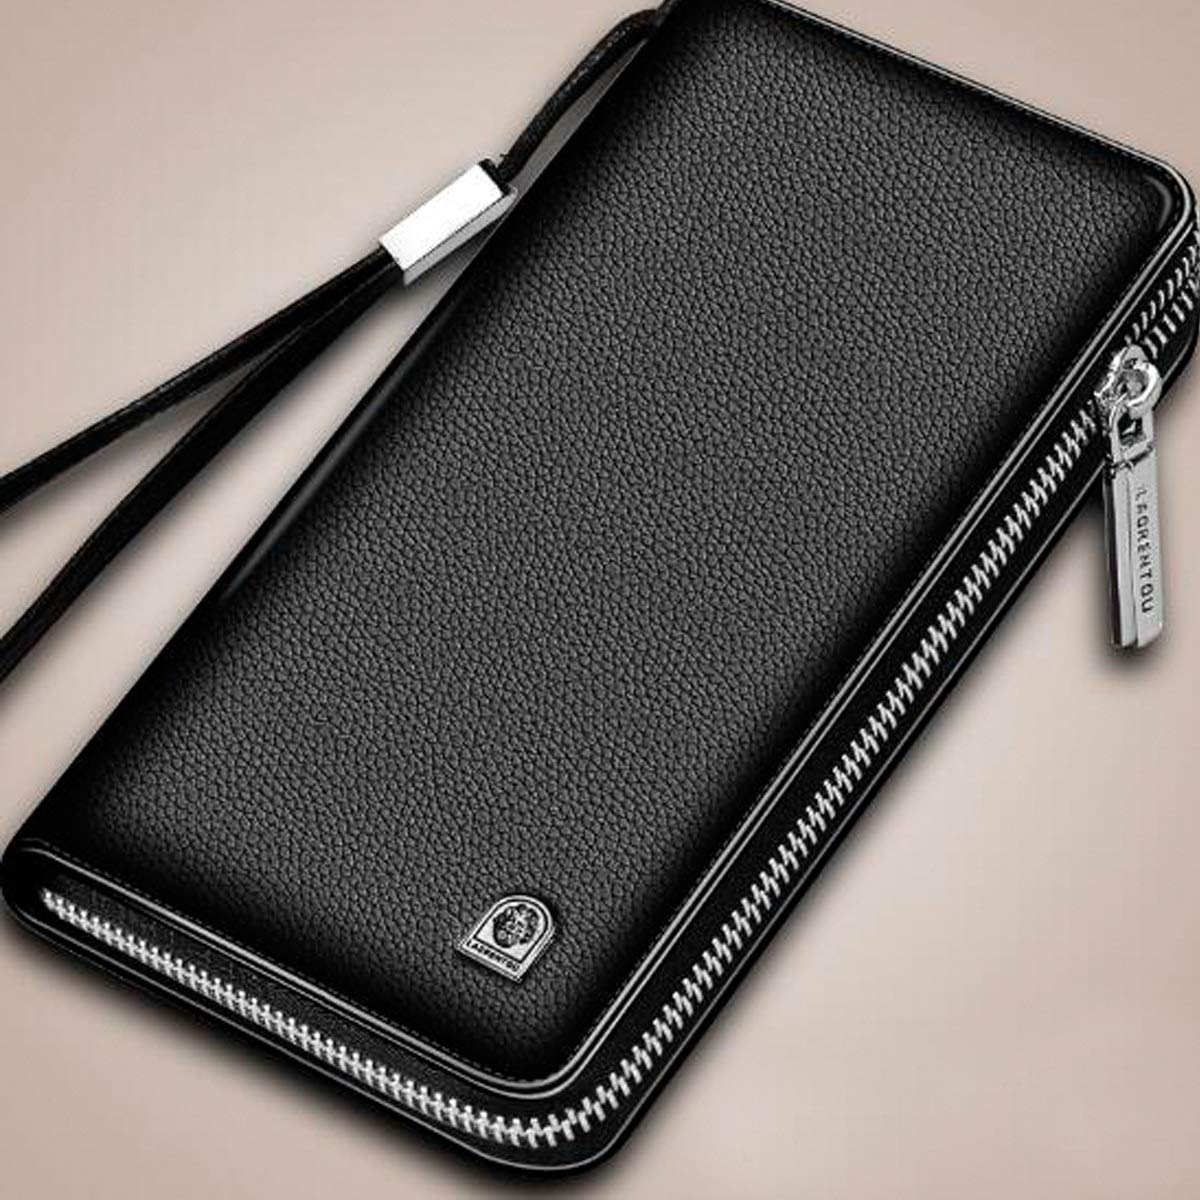 Large Travel Wallet Handbag Mens Boxed Gift Color : Brown 1 Kalmar RFID Travel Wallet Stealth Mode Mens Zipper Wallet Clutch Bag Card Package Extra Capacity Travel Wallet